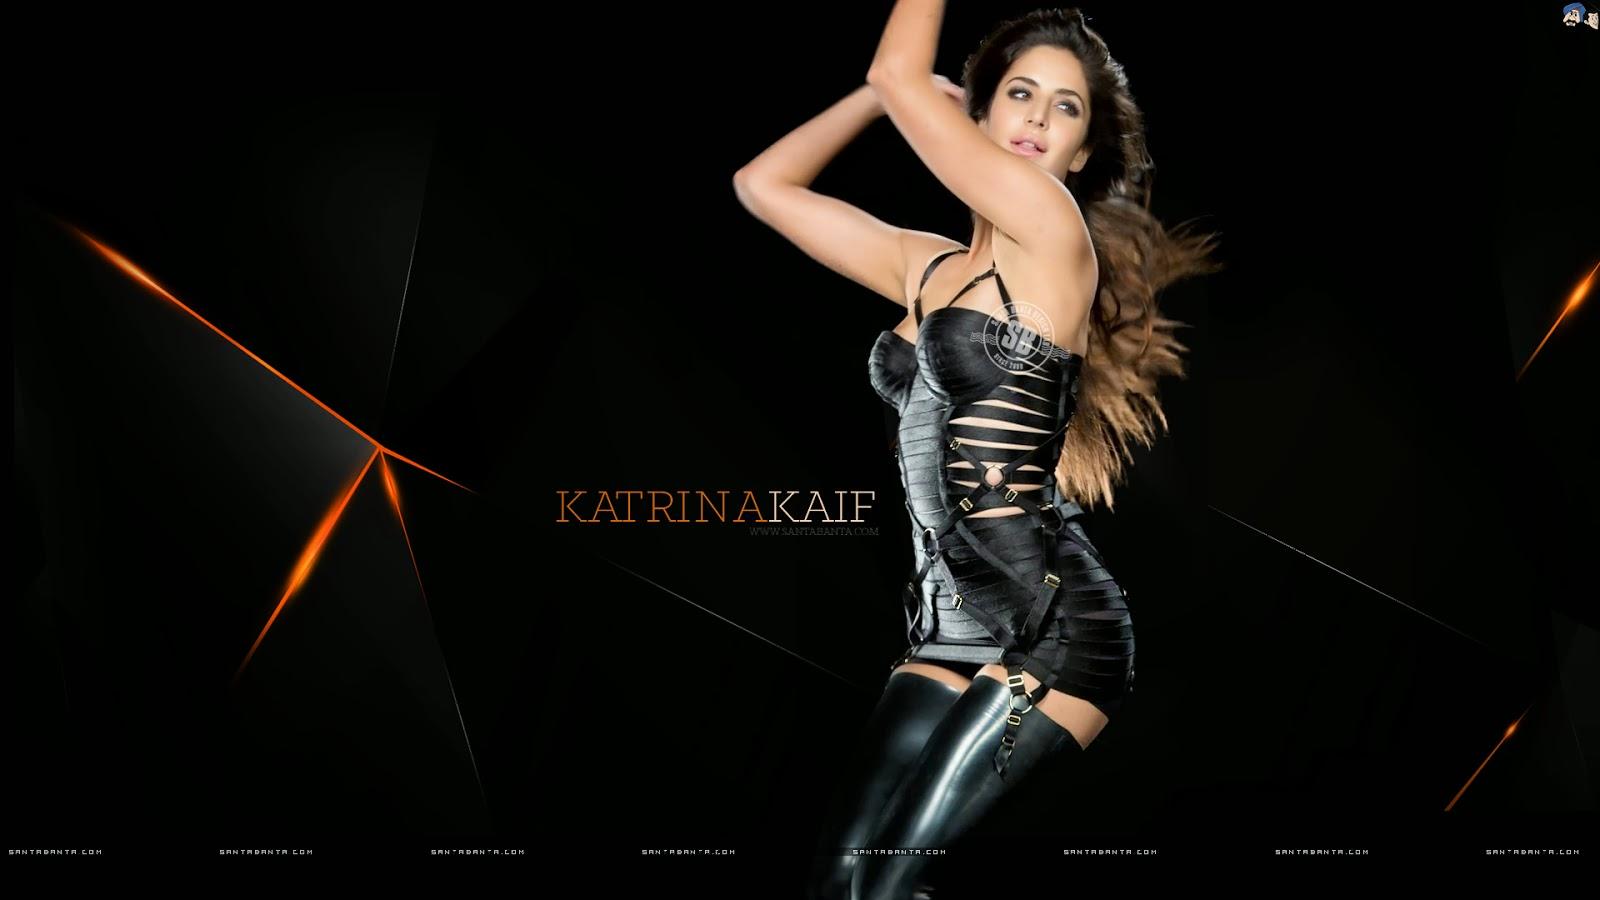 Speaking. katrina kaif hot boom not